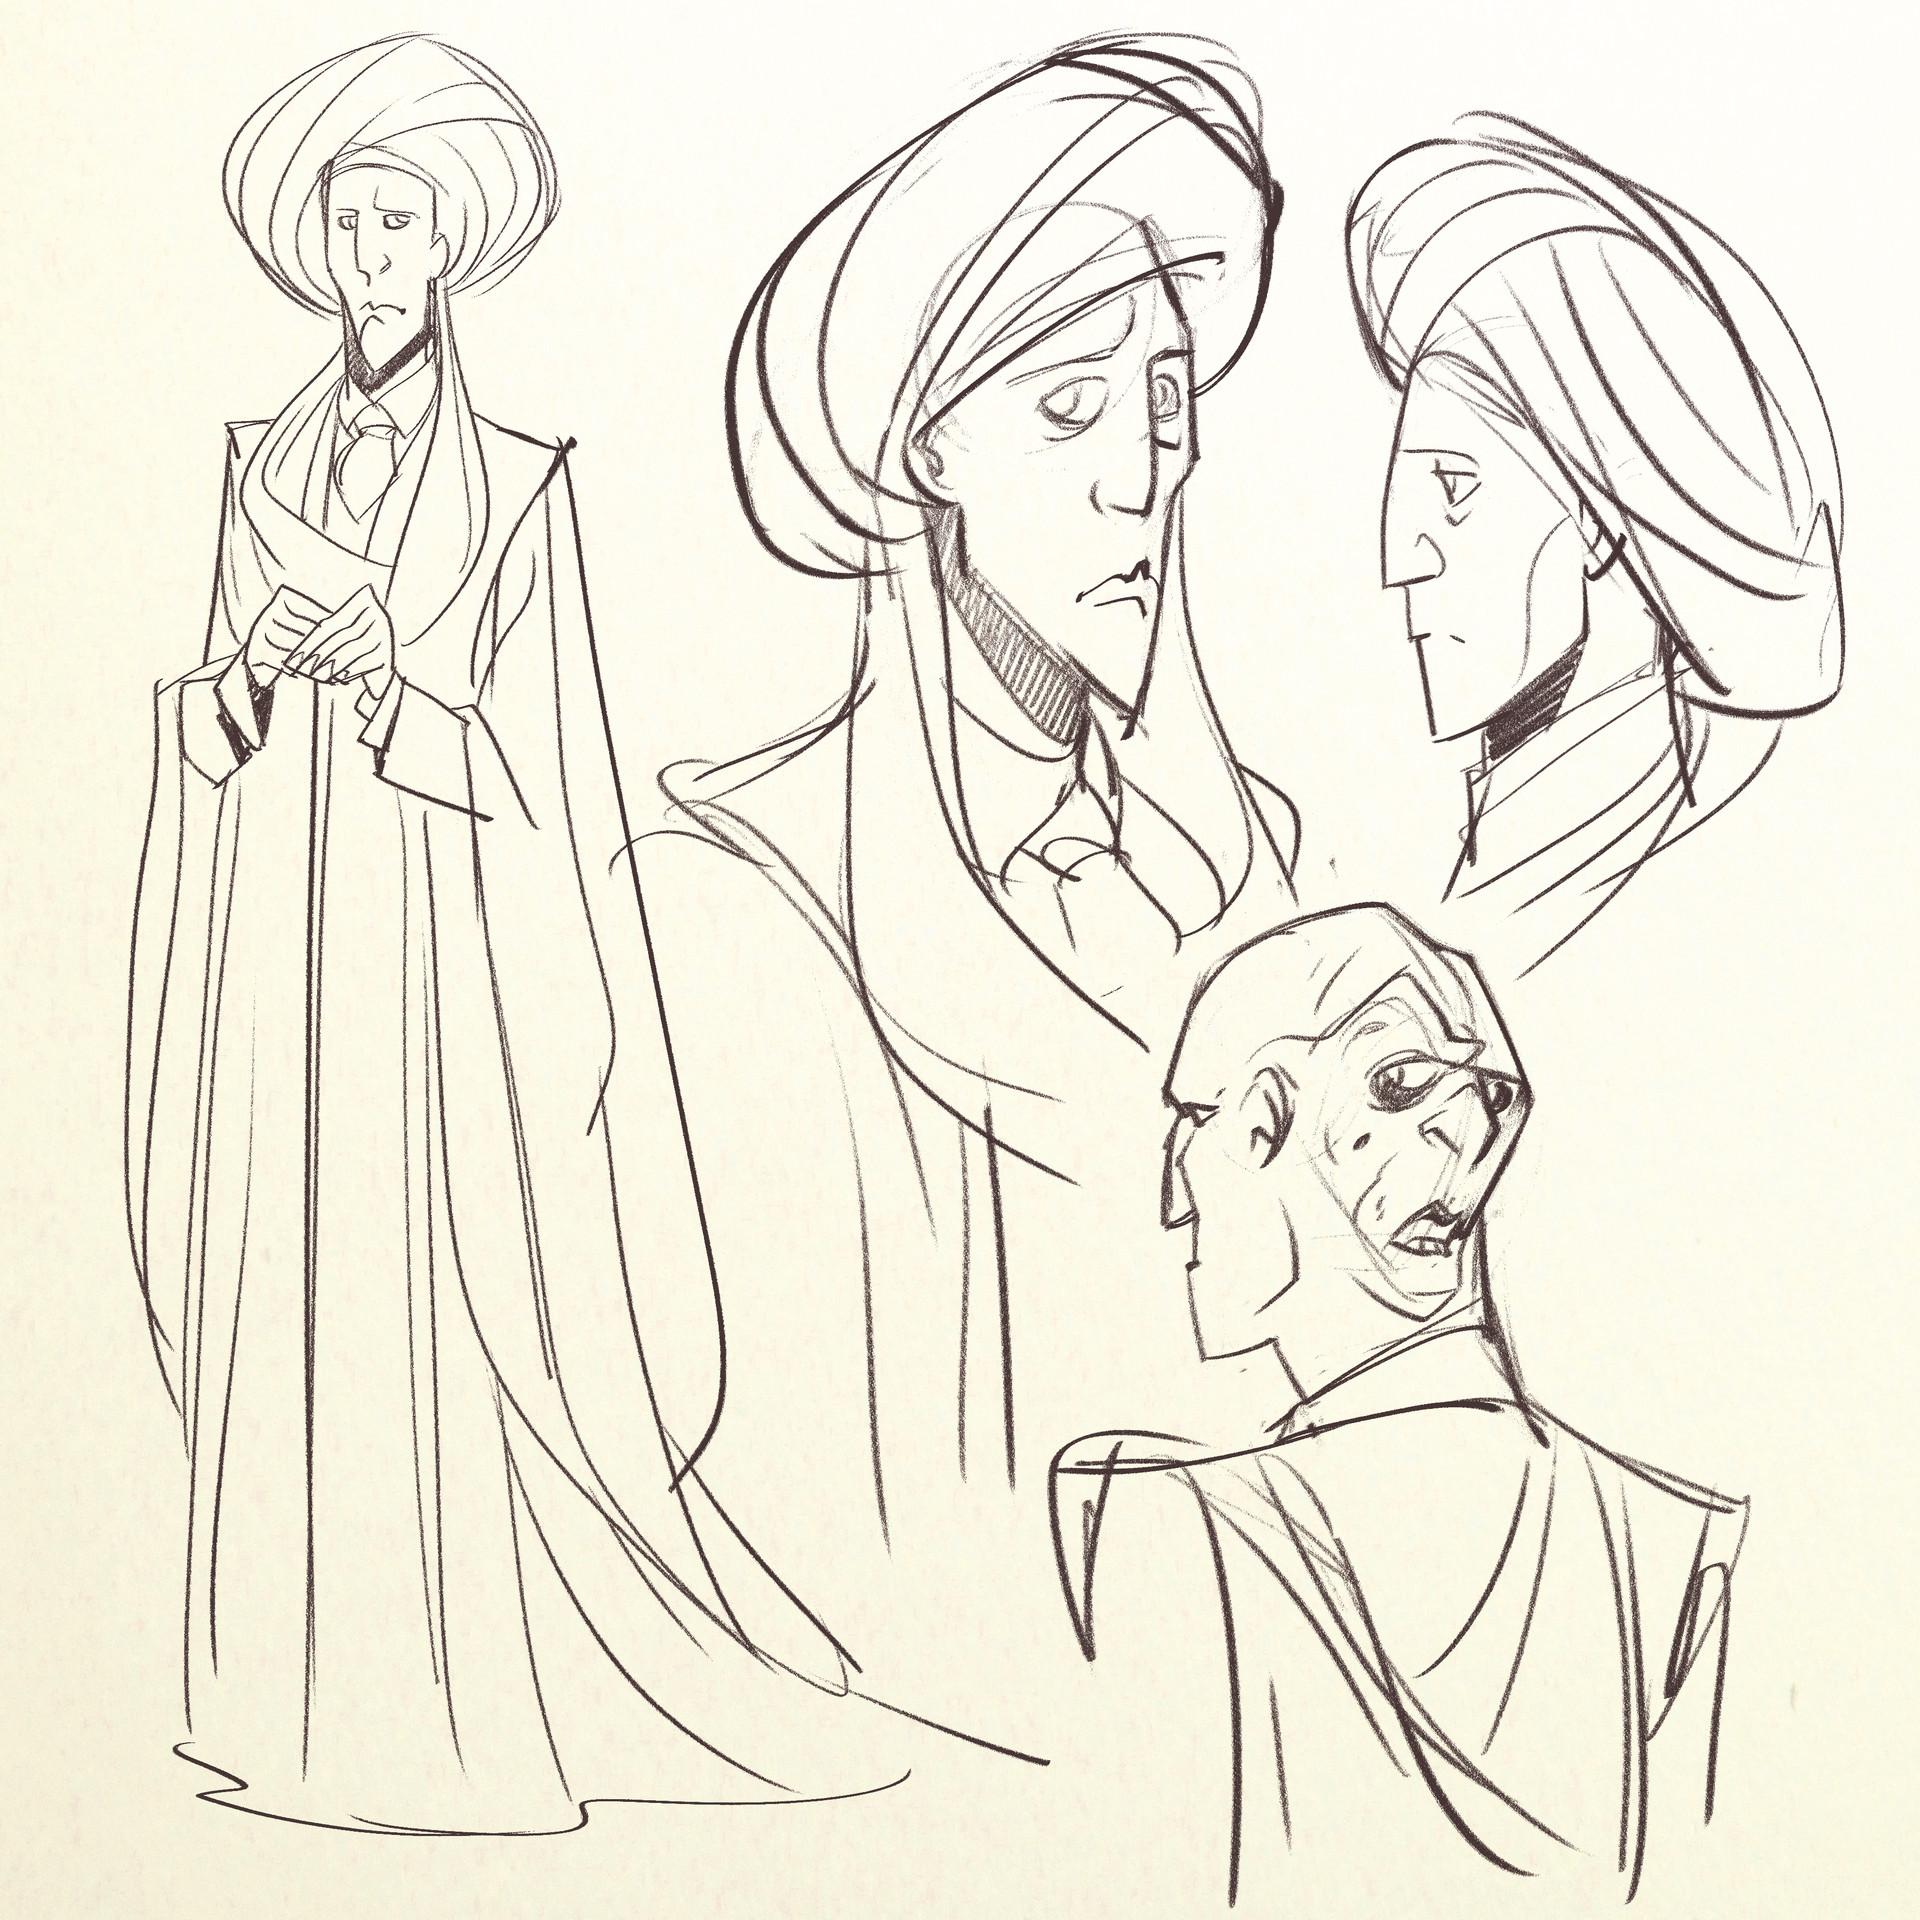 Valerio dreelrayk buonfantino quirrell sketches